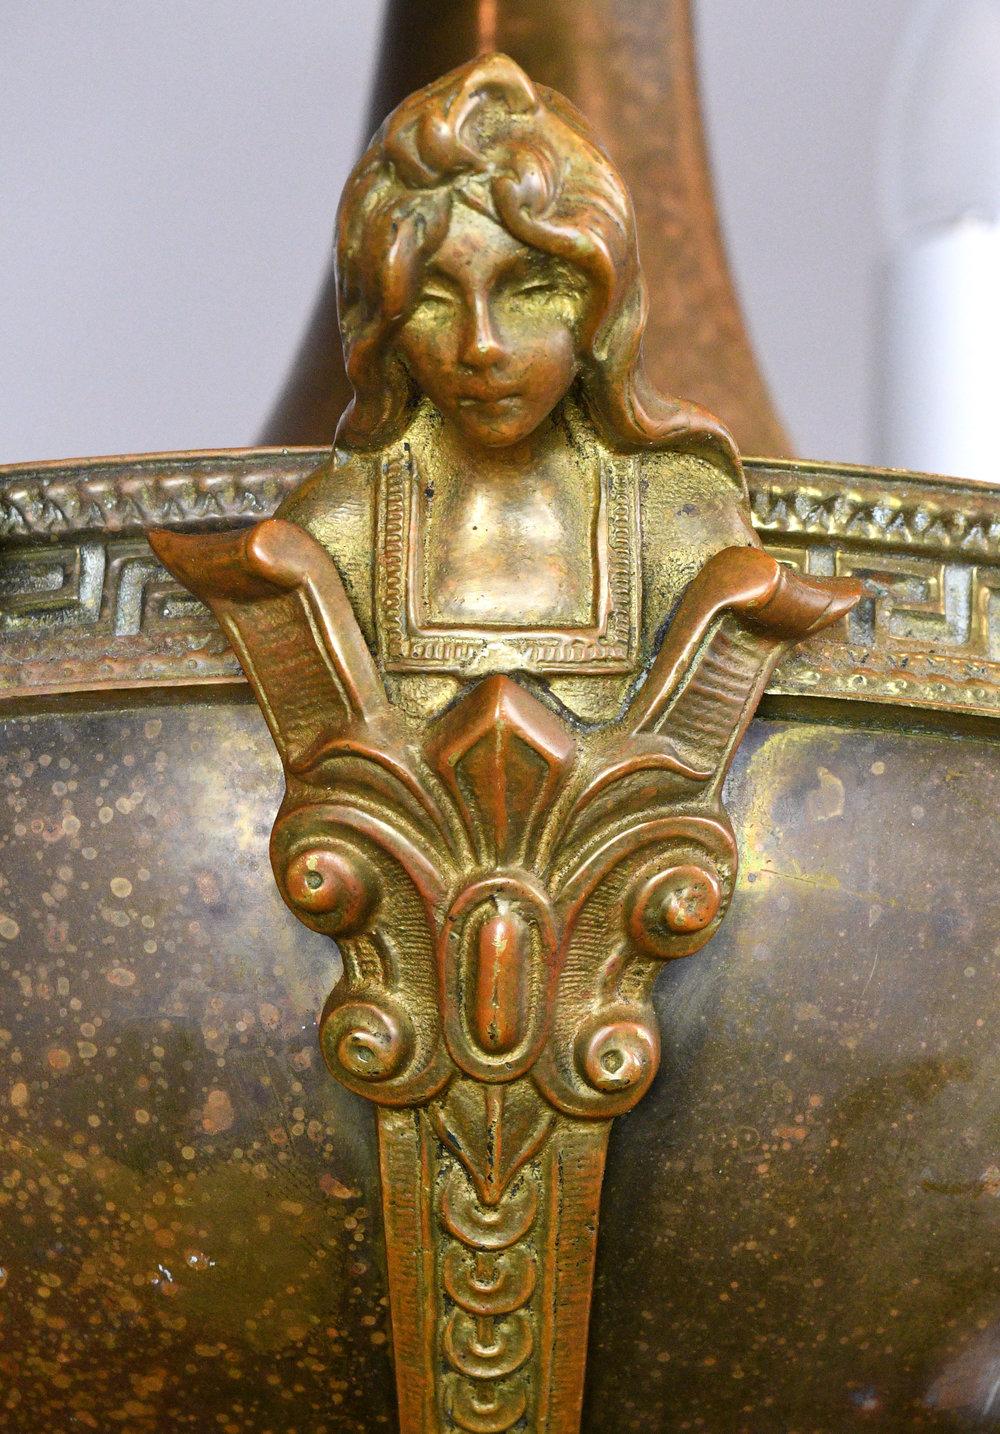 47592-figural-6-candle-bronze-chandelier-woman.jpg